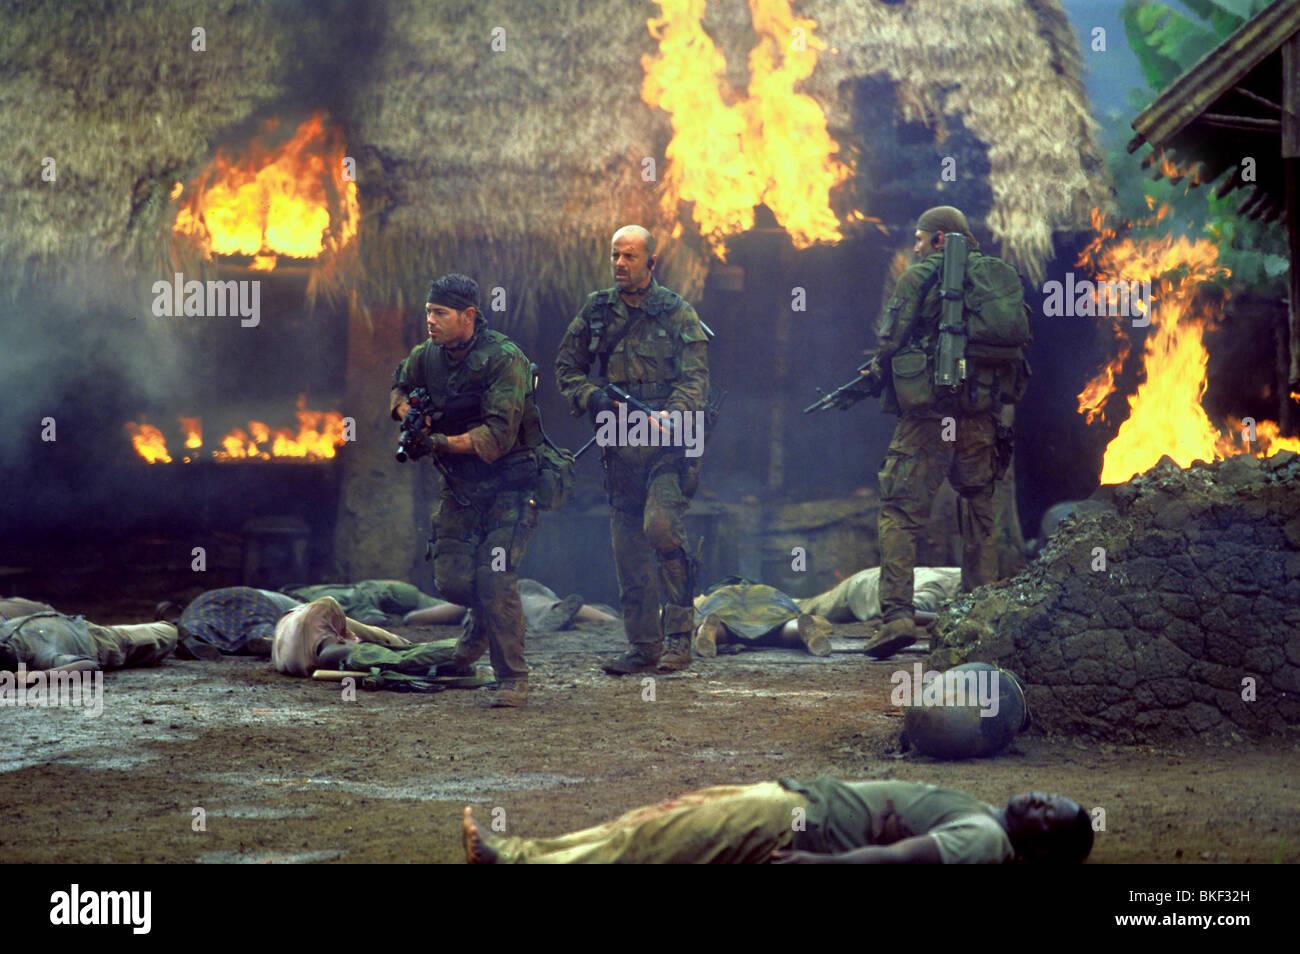 TEARS OF THE SUN (2003) PAUL FRANCIS, BRUCE WILLIS, NICK ...